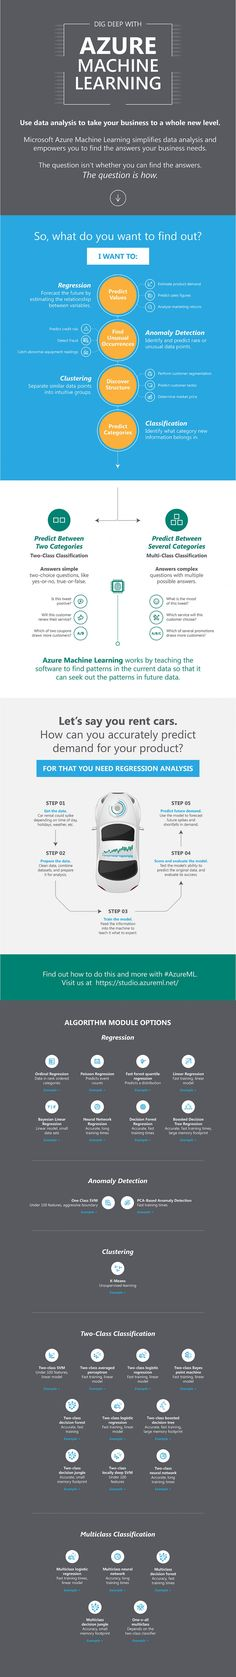 Azure Machine Learning Infographic